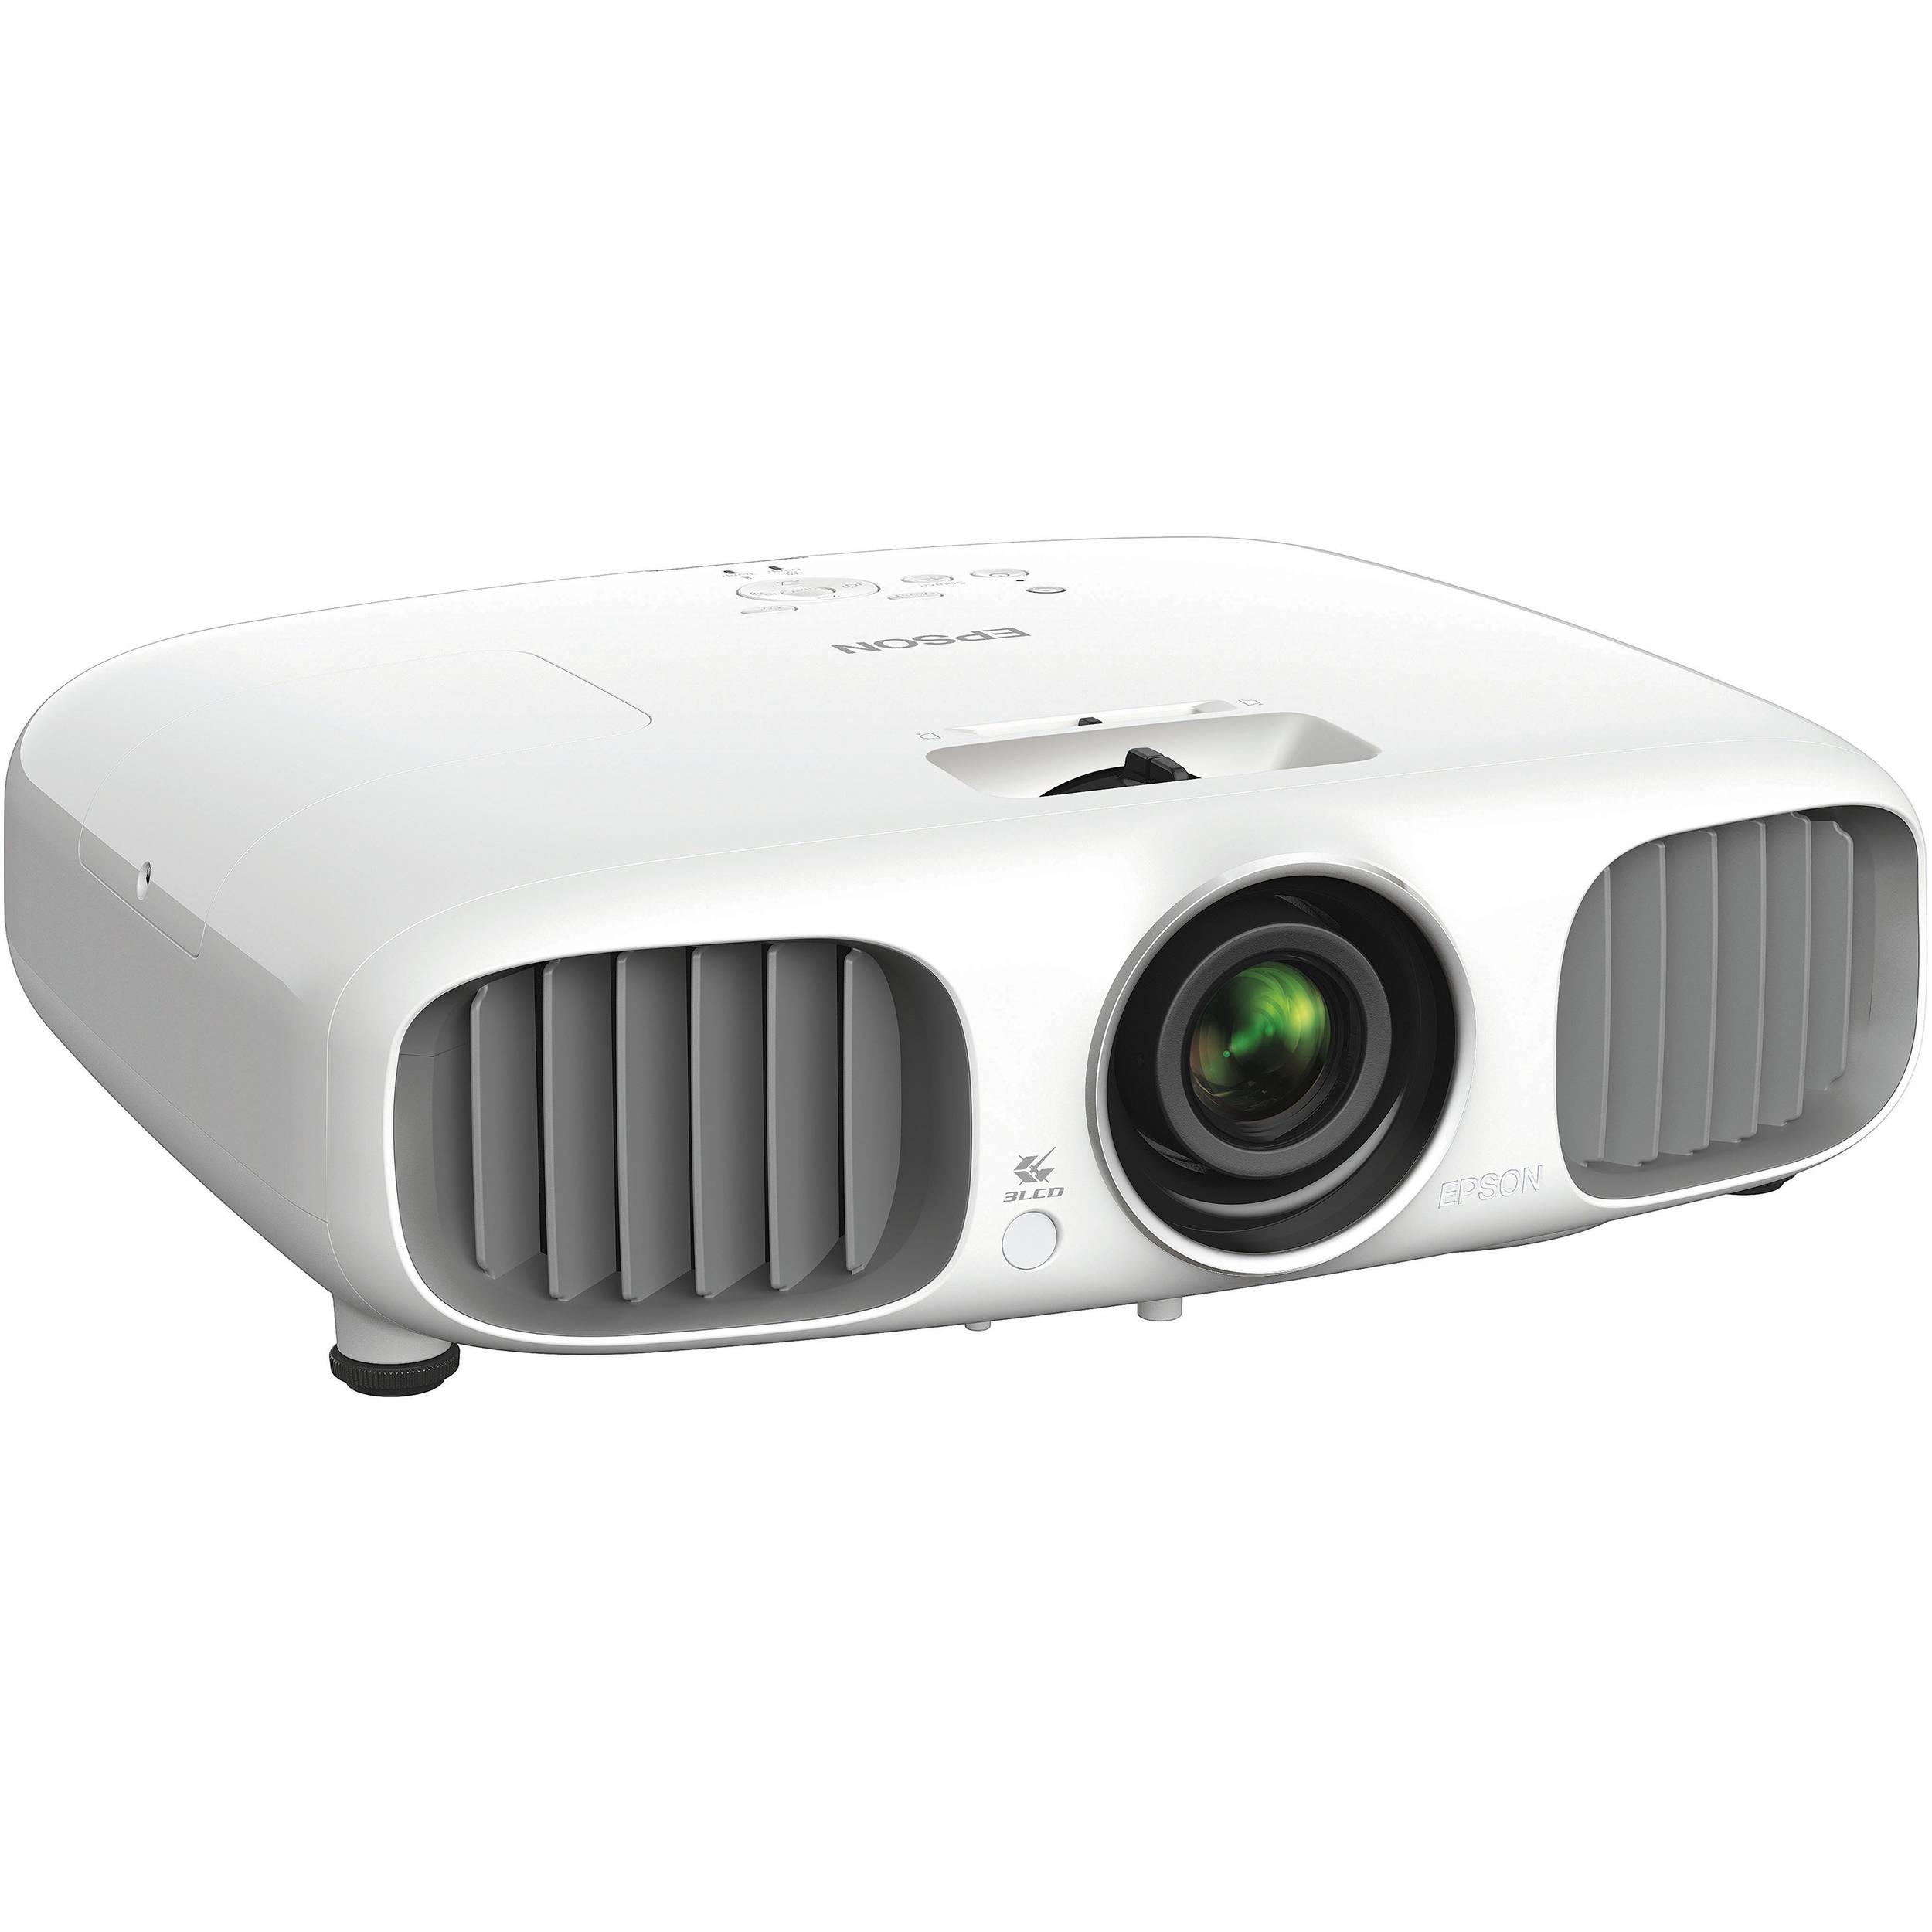 epson powerlite home cinema 3020e 3d 1080p 3lcd v11h502020 b h rh bhphotovideo com HD 3D Projektor Epson 3020 epson 3020 3d projector review